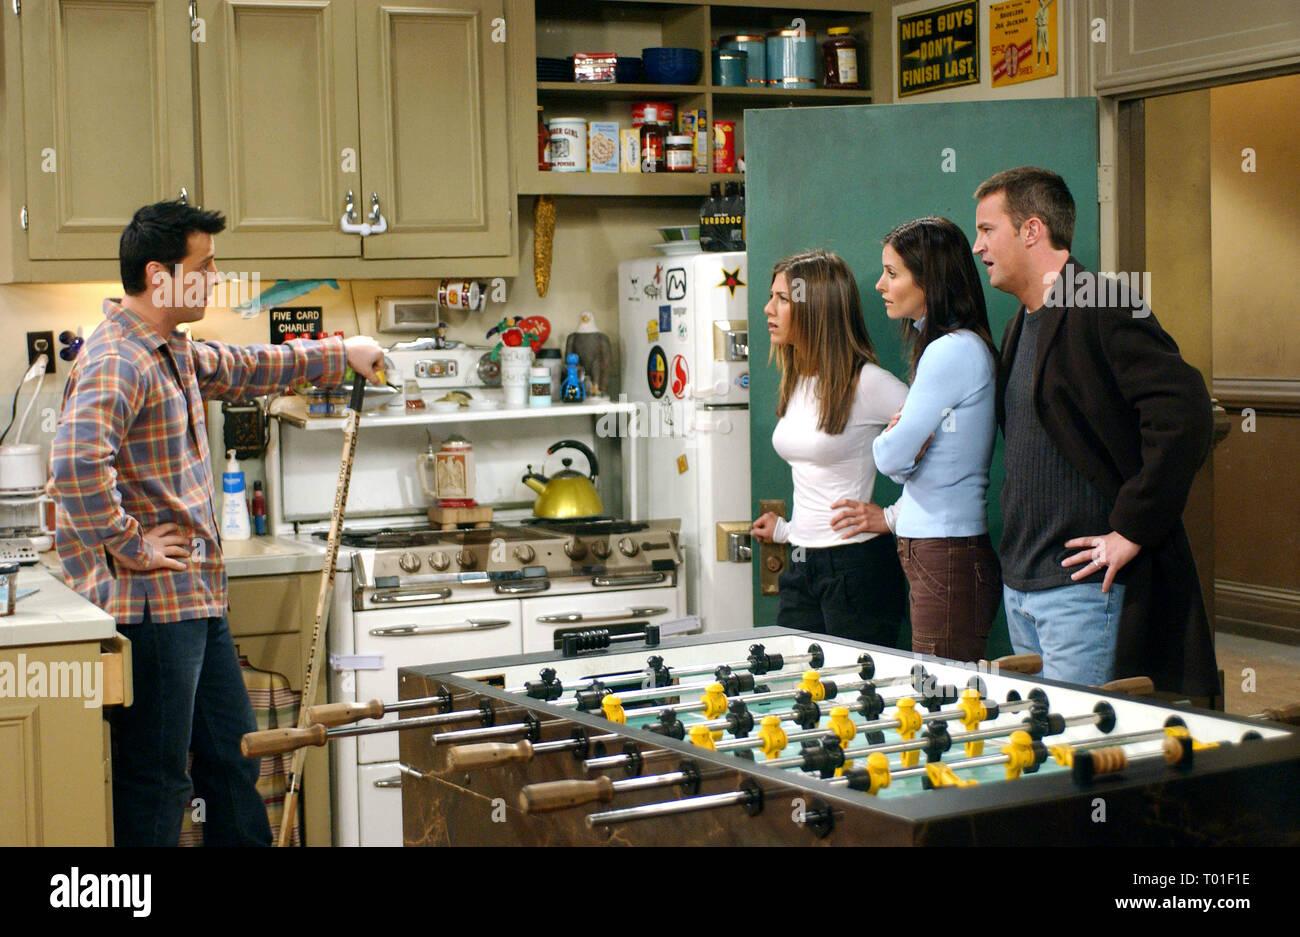 Amigos : Temporada 9, Matt LEBLANC, Jennifer Aniston, COURTENEY COX, Matthew Perry, 2002 Foto de stock